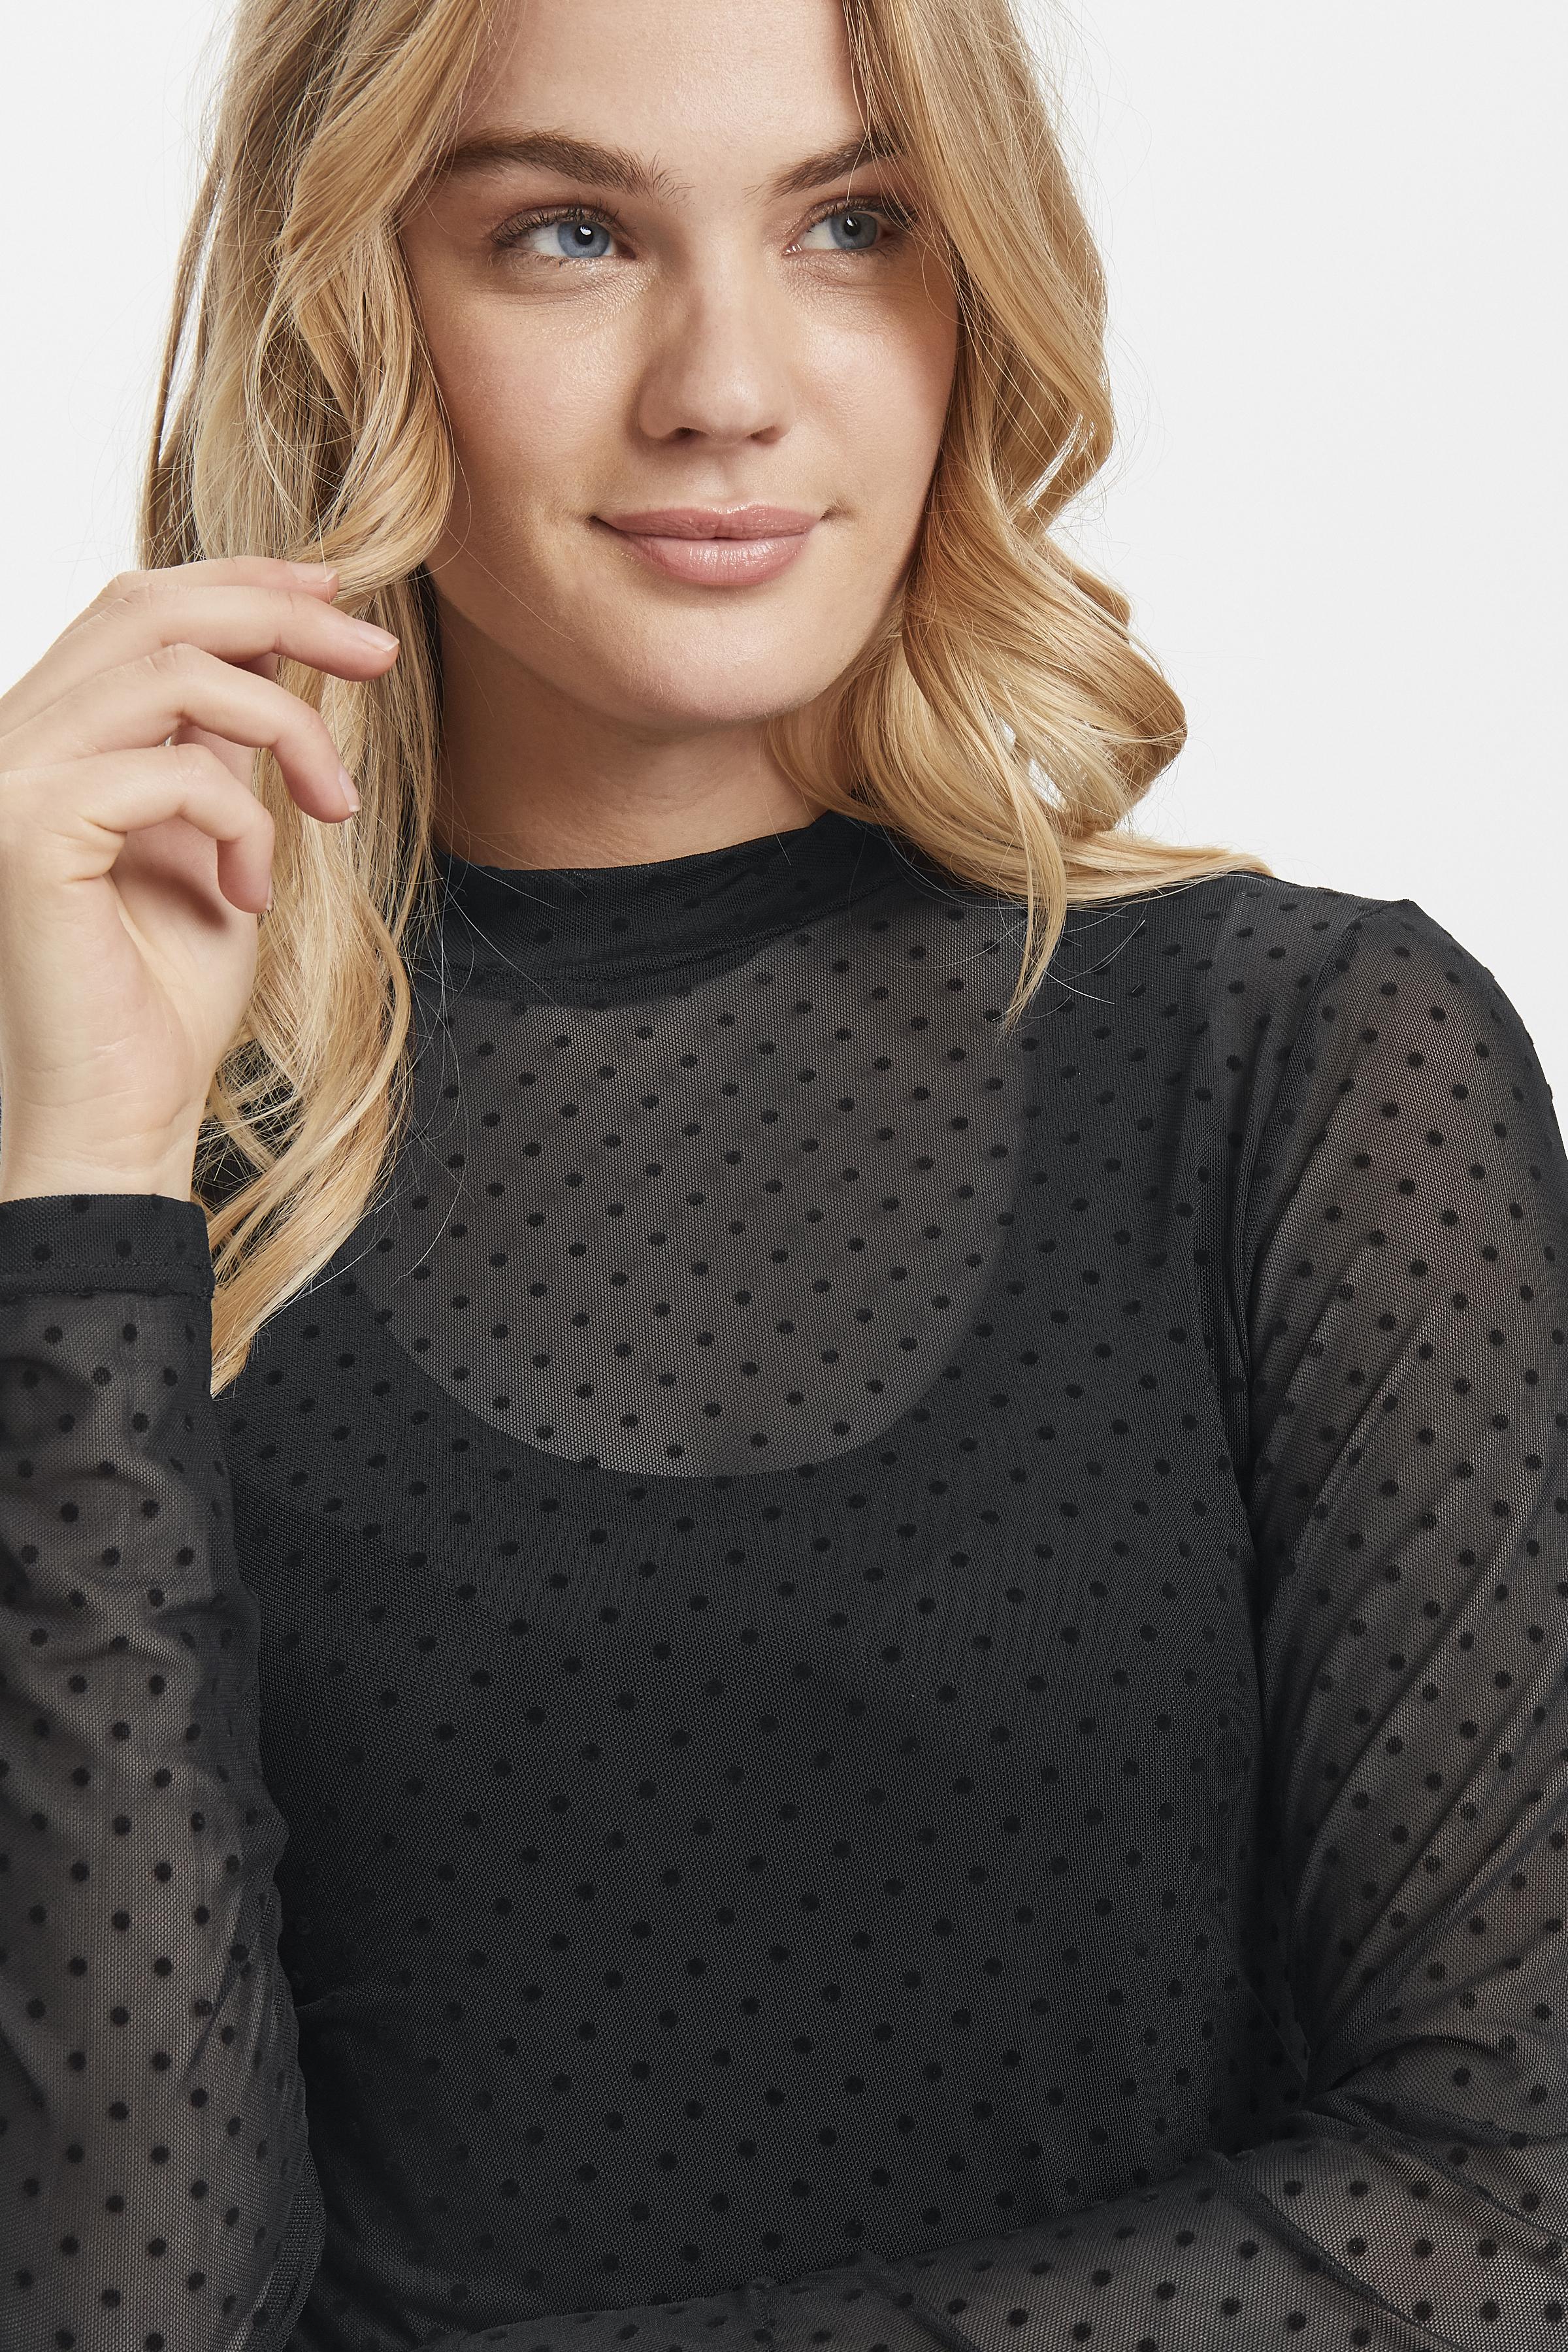 Black dot Combi 1 Langarm-Bluse von b.young – Kaufen Sie Black dot Combi 1 Langarm-Bluse aus Größe XS-XL hier